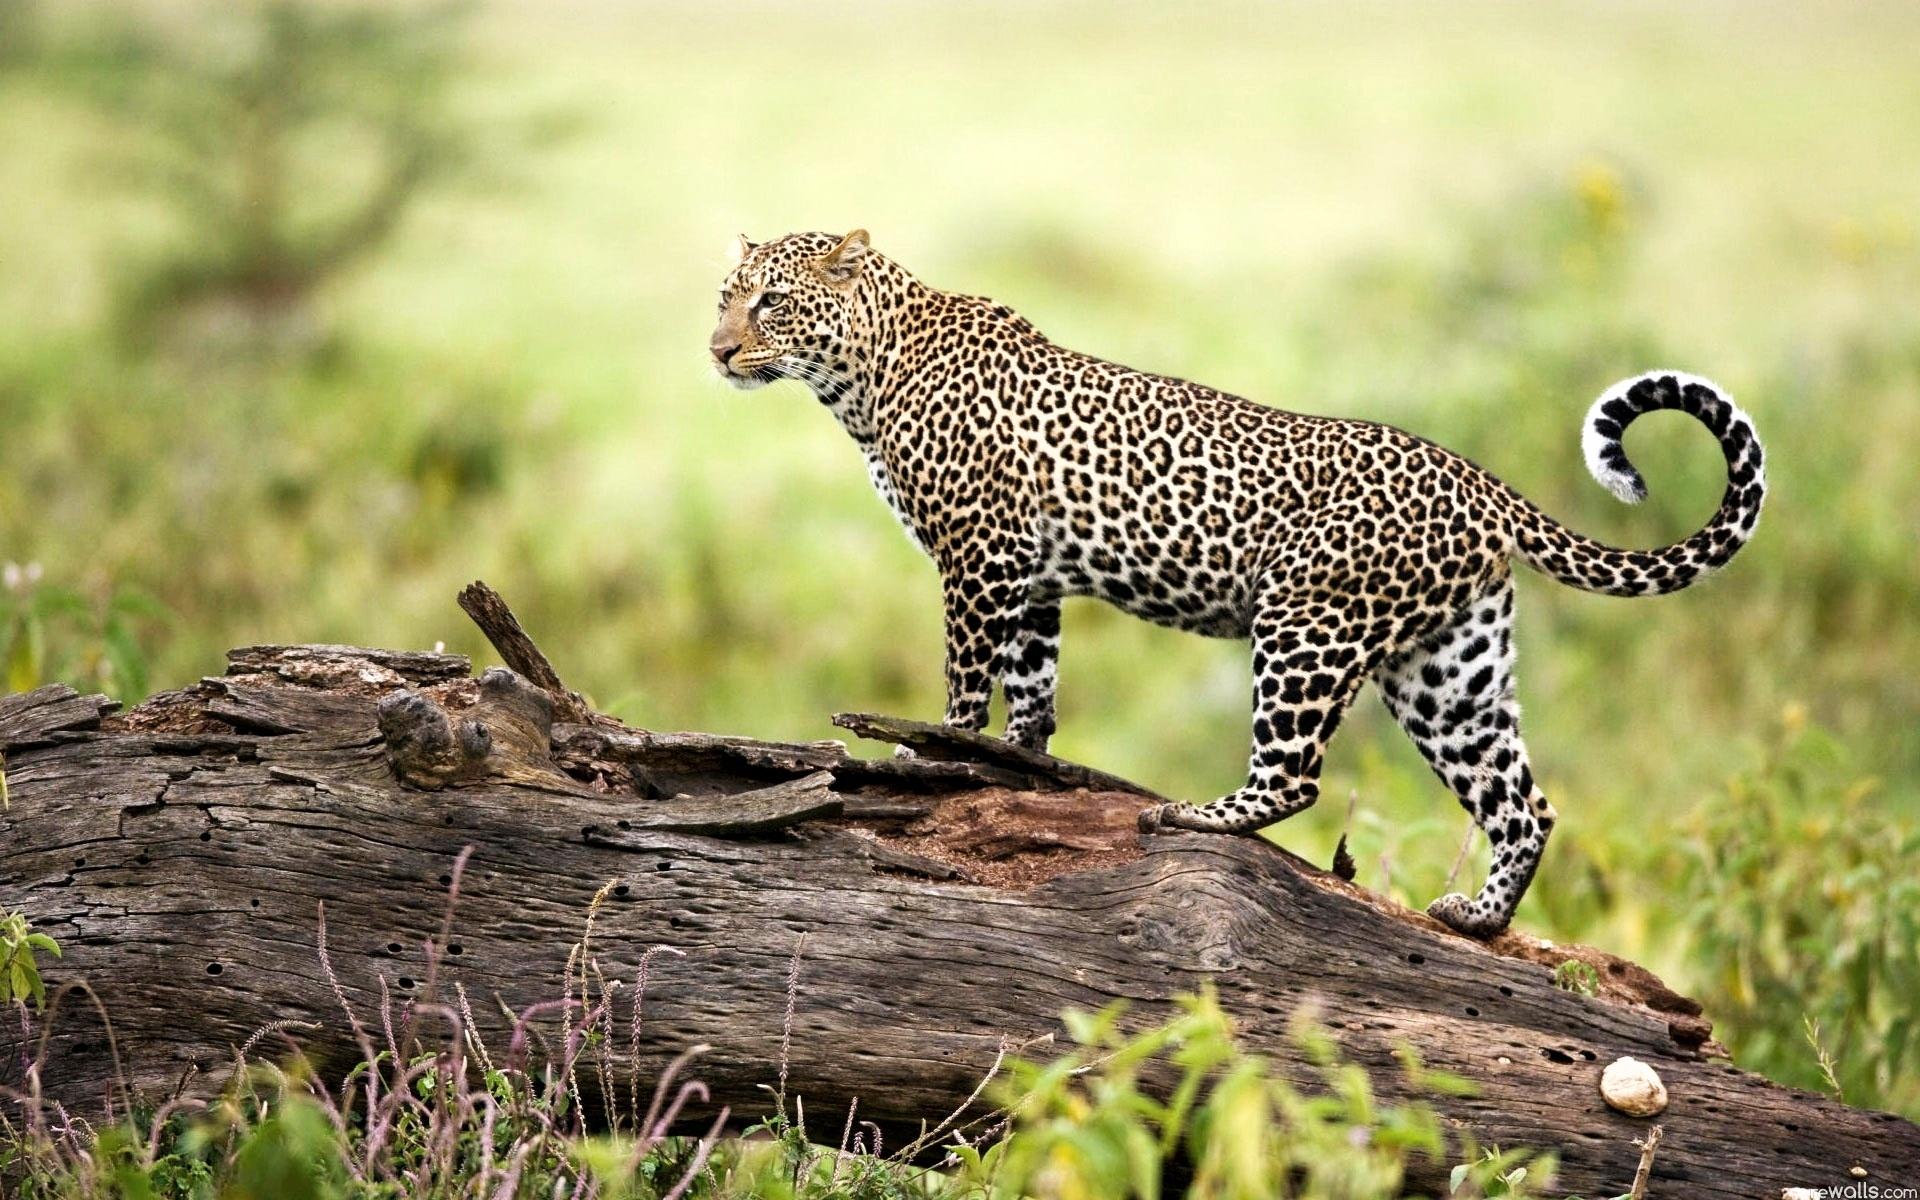 Leopard Wildlife Wallpapers HD Wallpapers 1920x1200